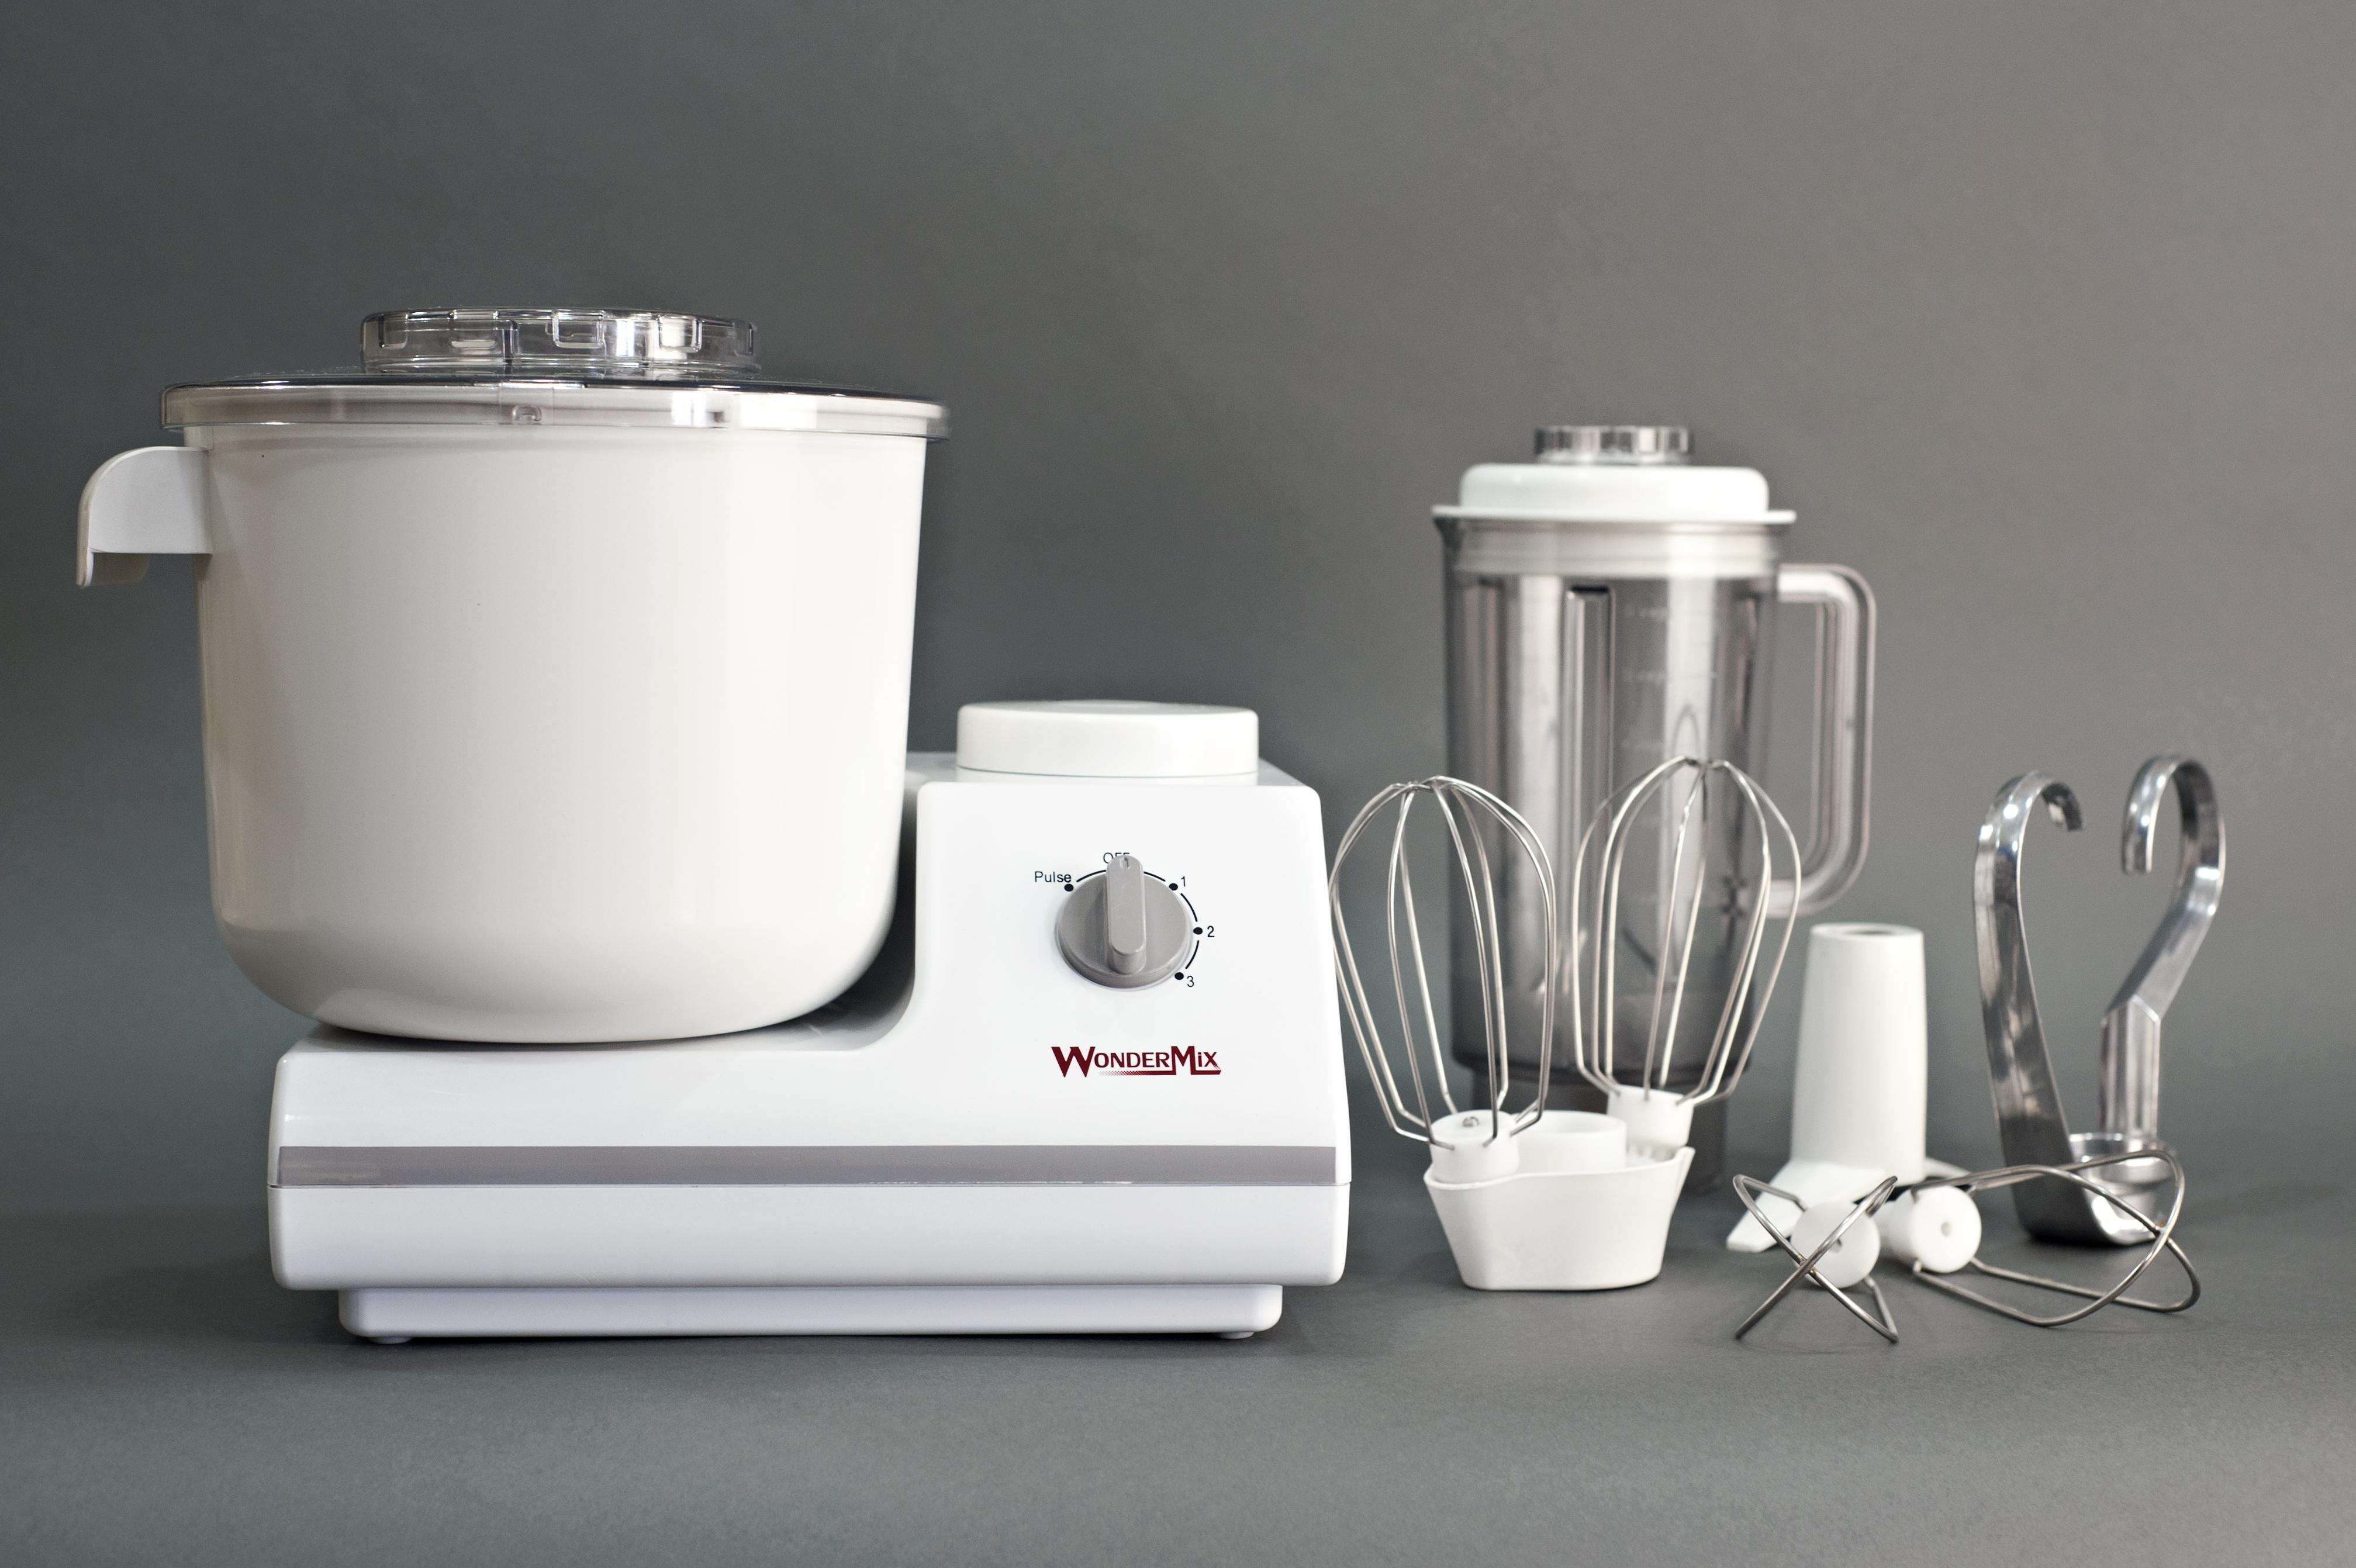 wondermix mixer and accessories. Interior Design Ideas. Home Design Ideas